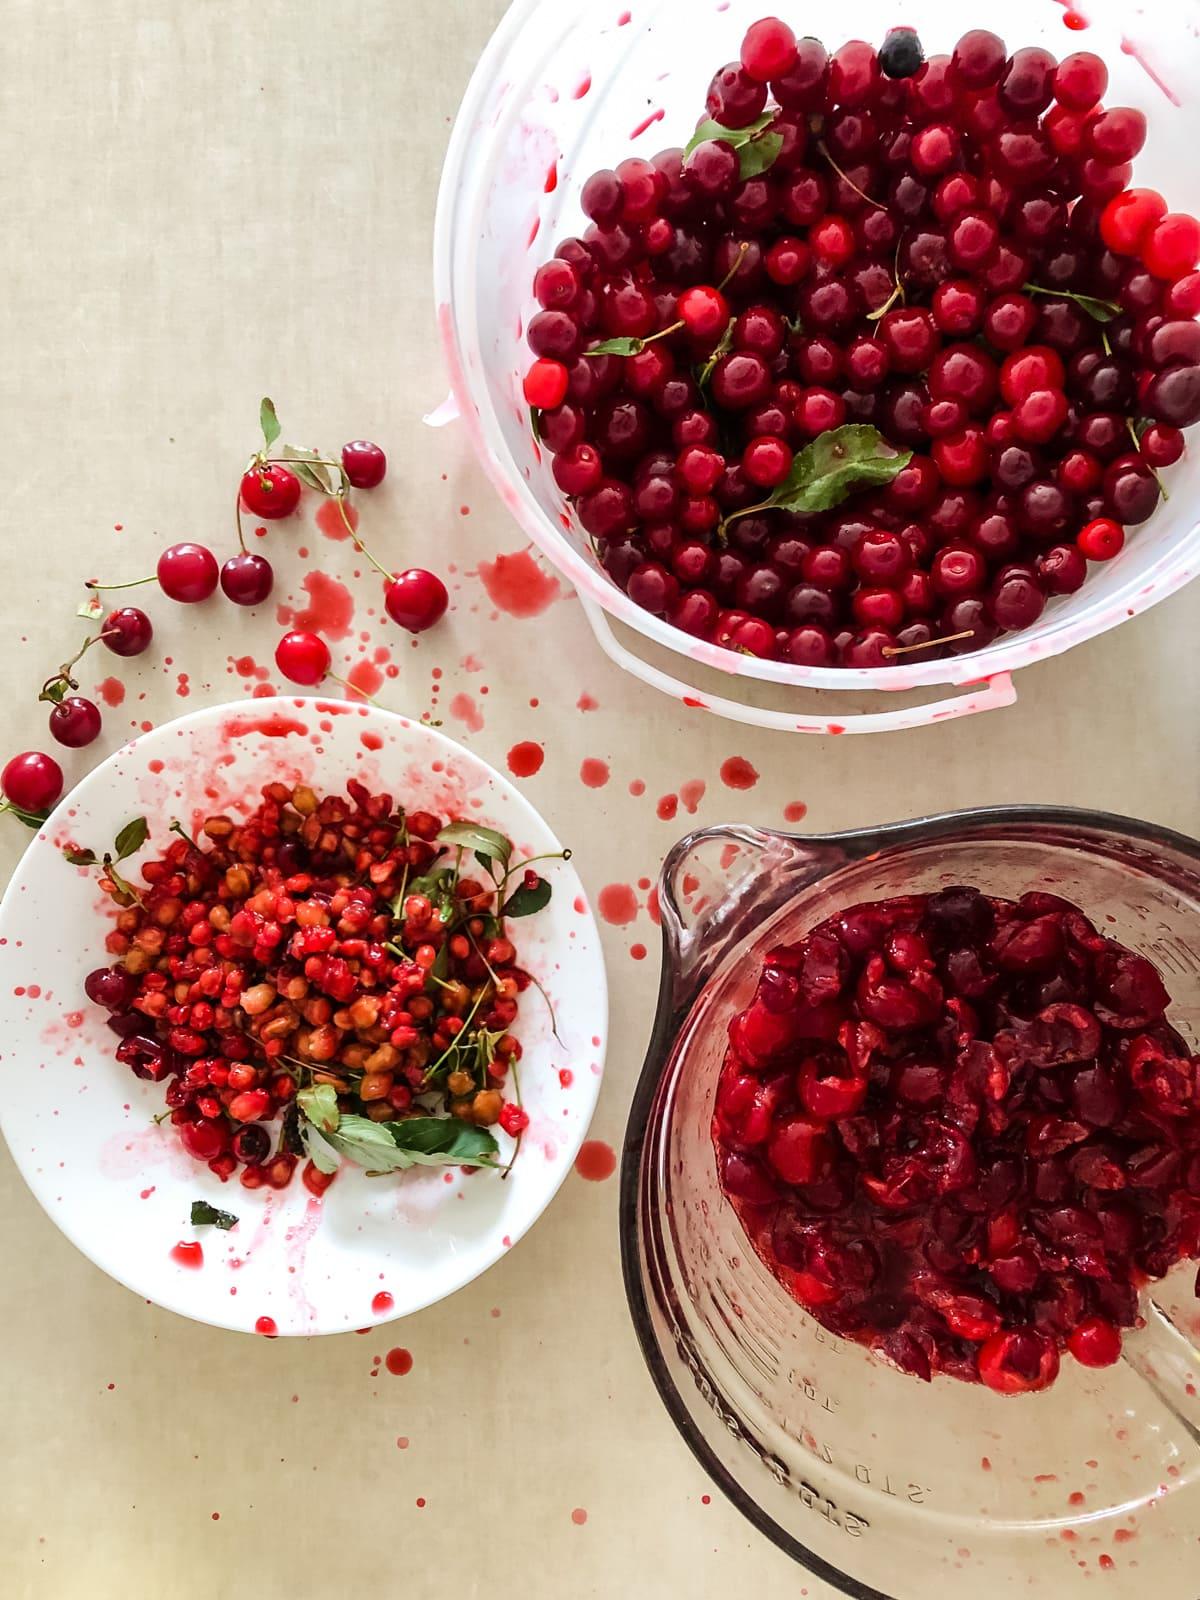 Pitting Sour Cherries